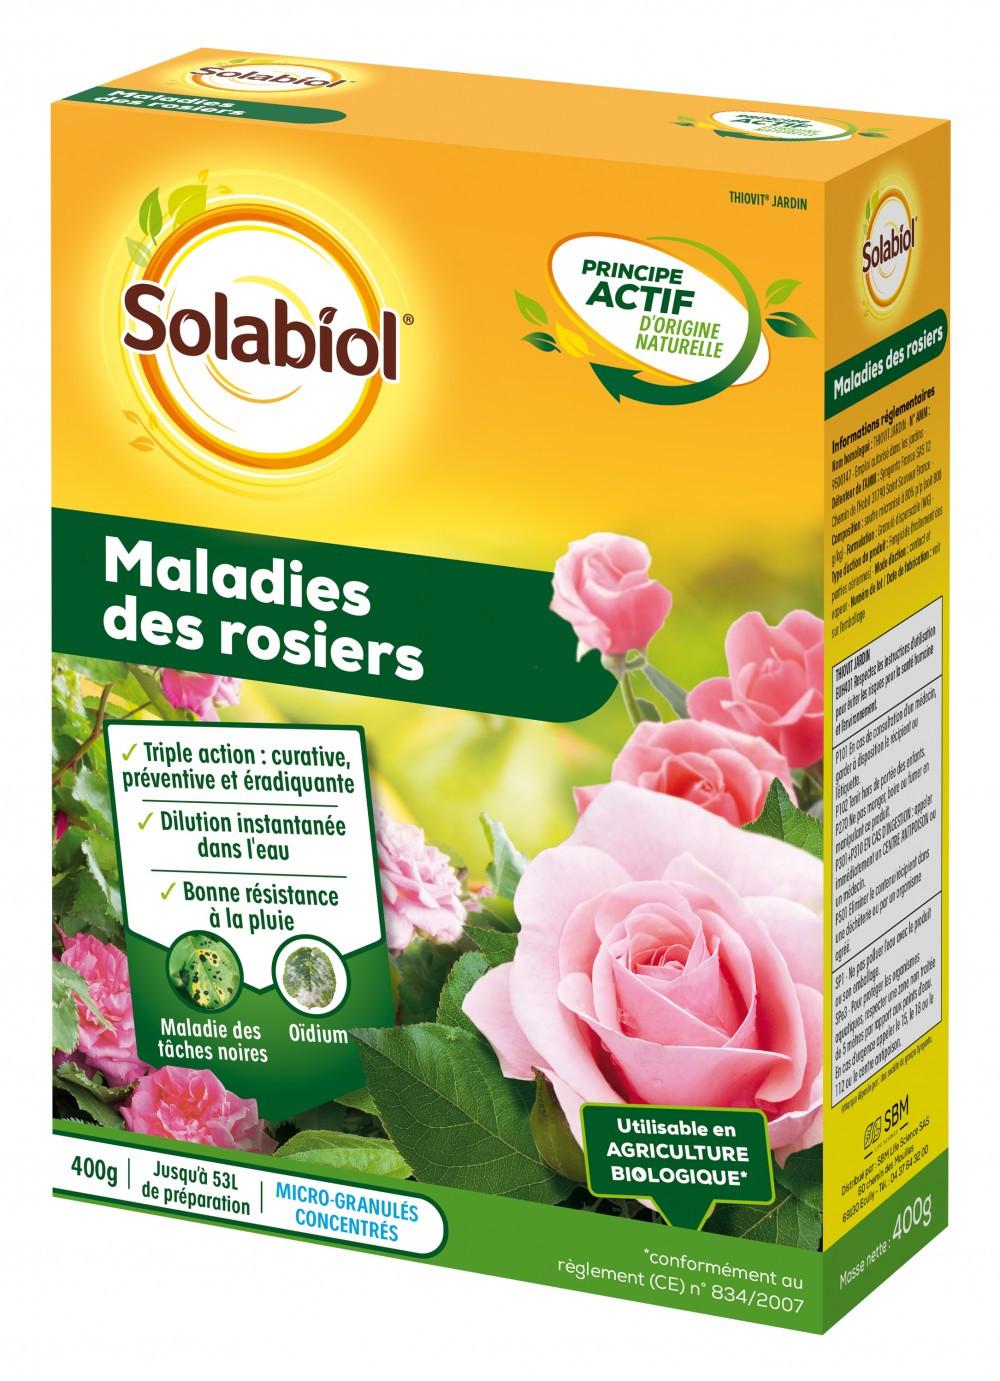 Traitement des maladies rosiers SOLABIOL, 400g